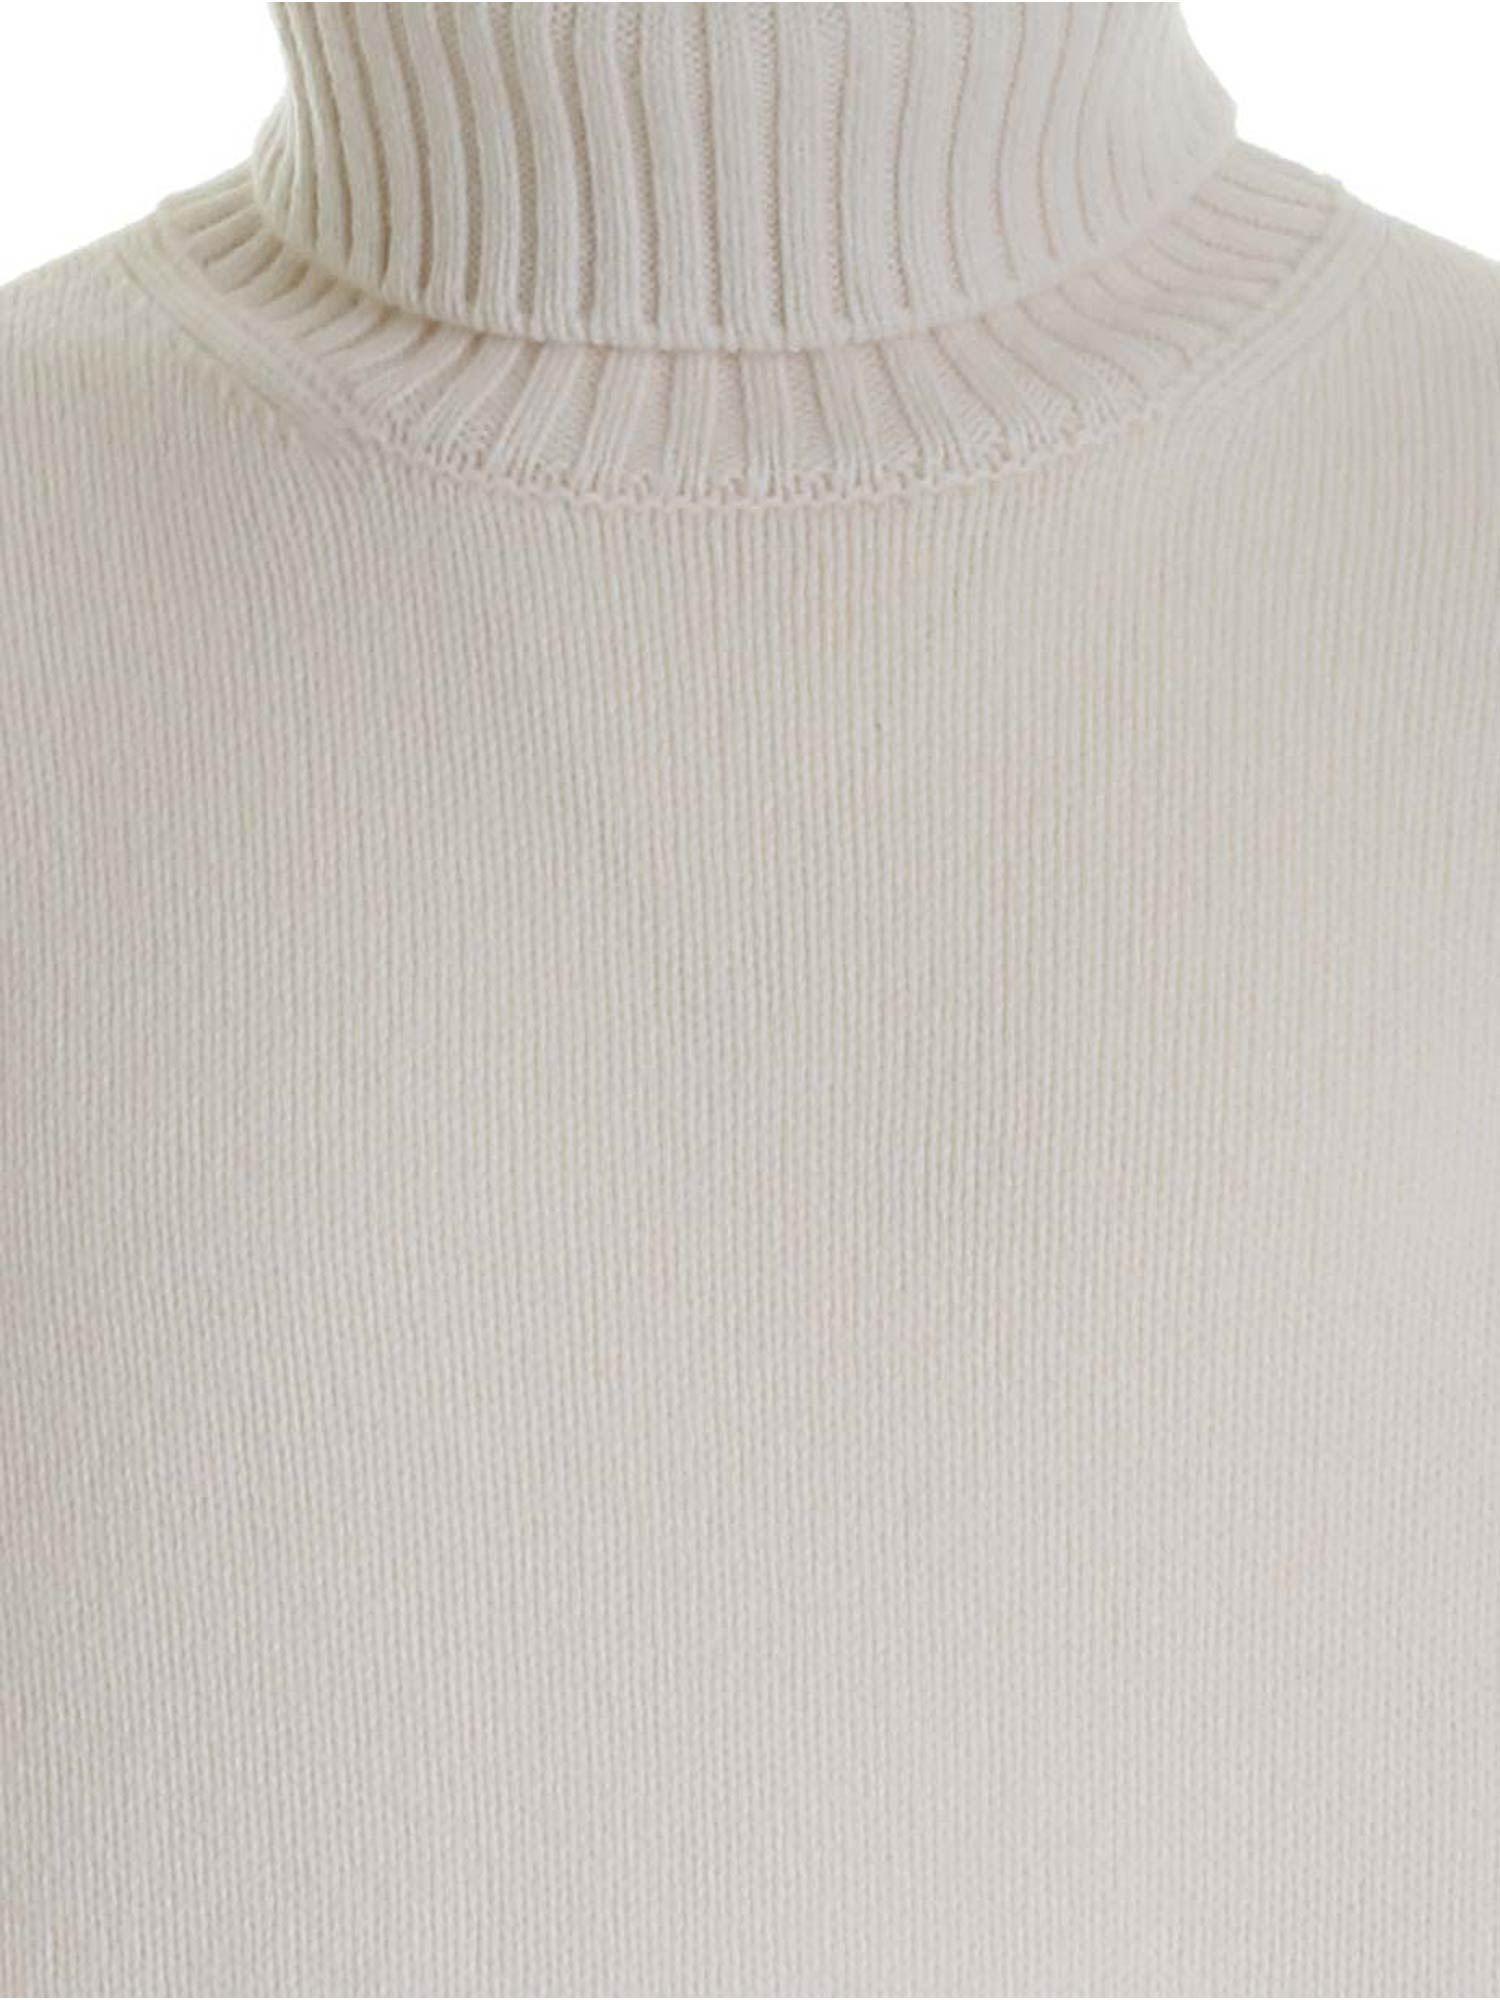 RIBBED EDGES TURTLENECK IN WHITE FAY | 10000016 | NMMC1412780SCYB004